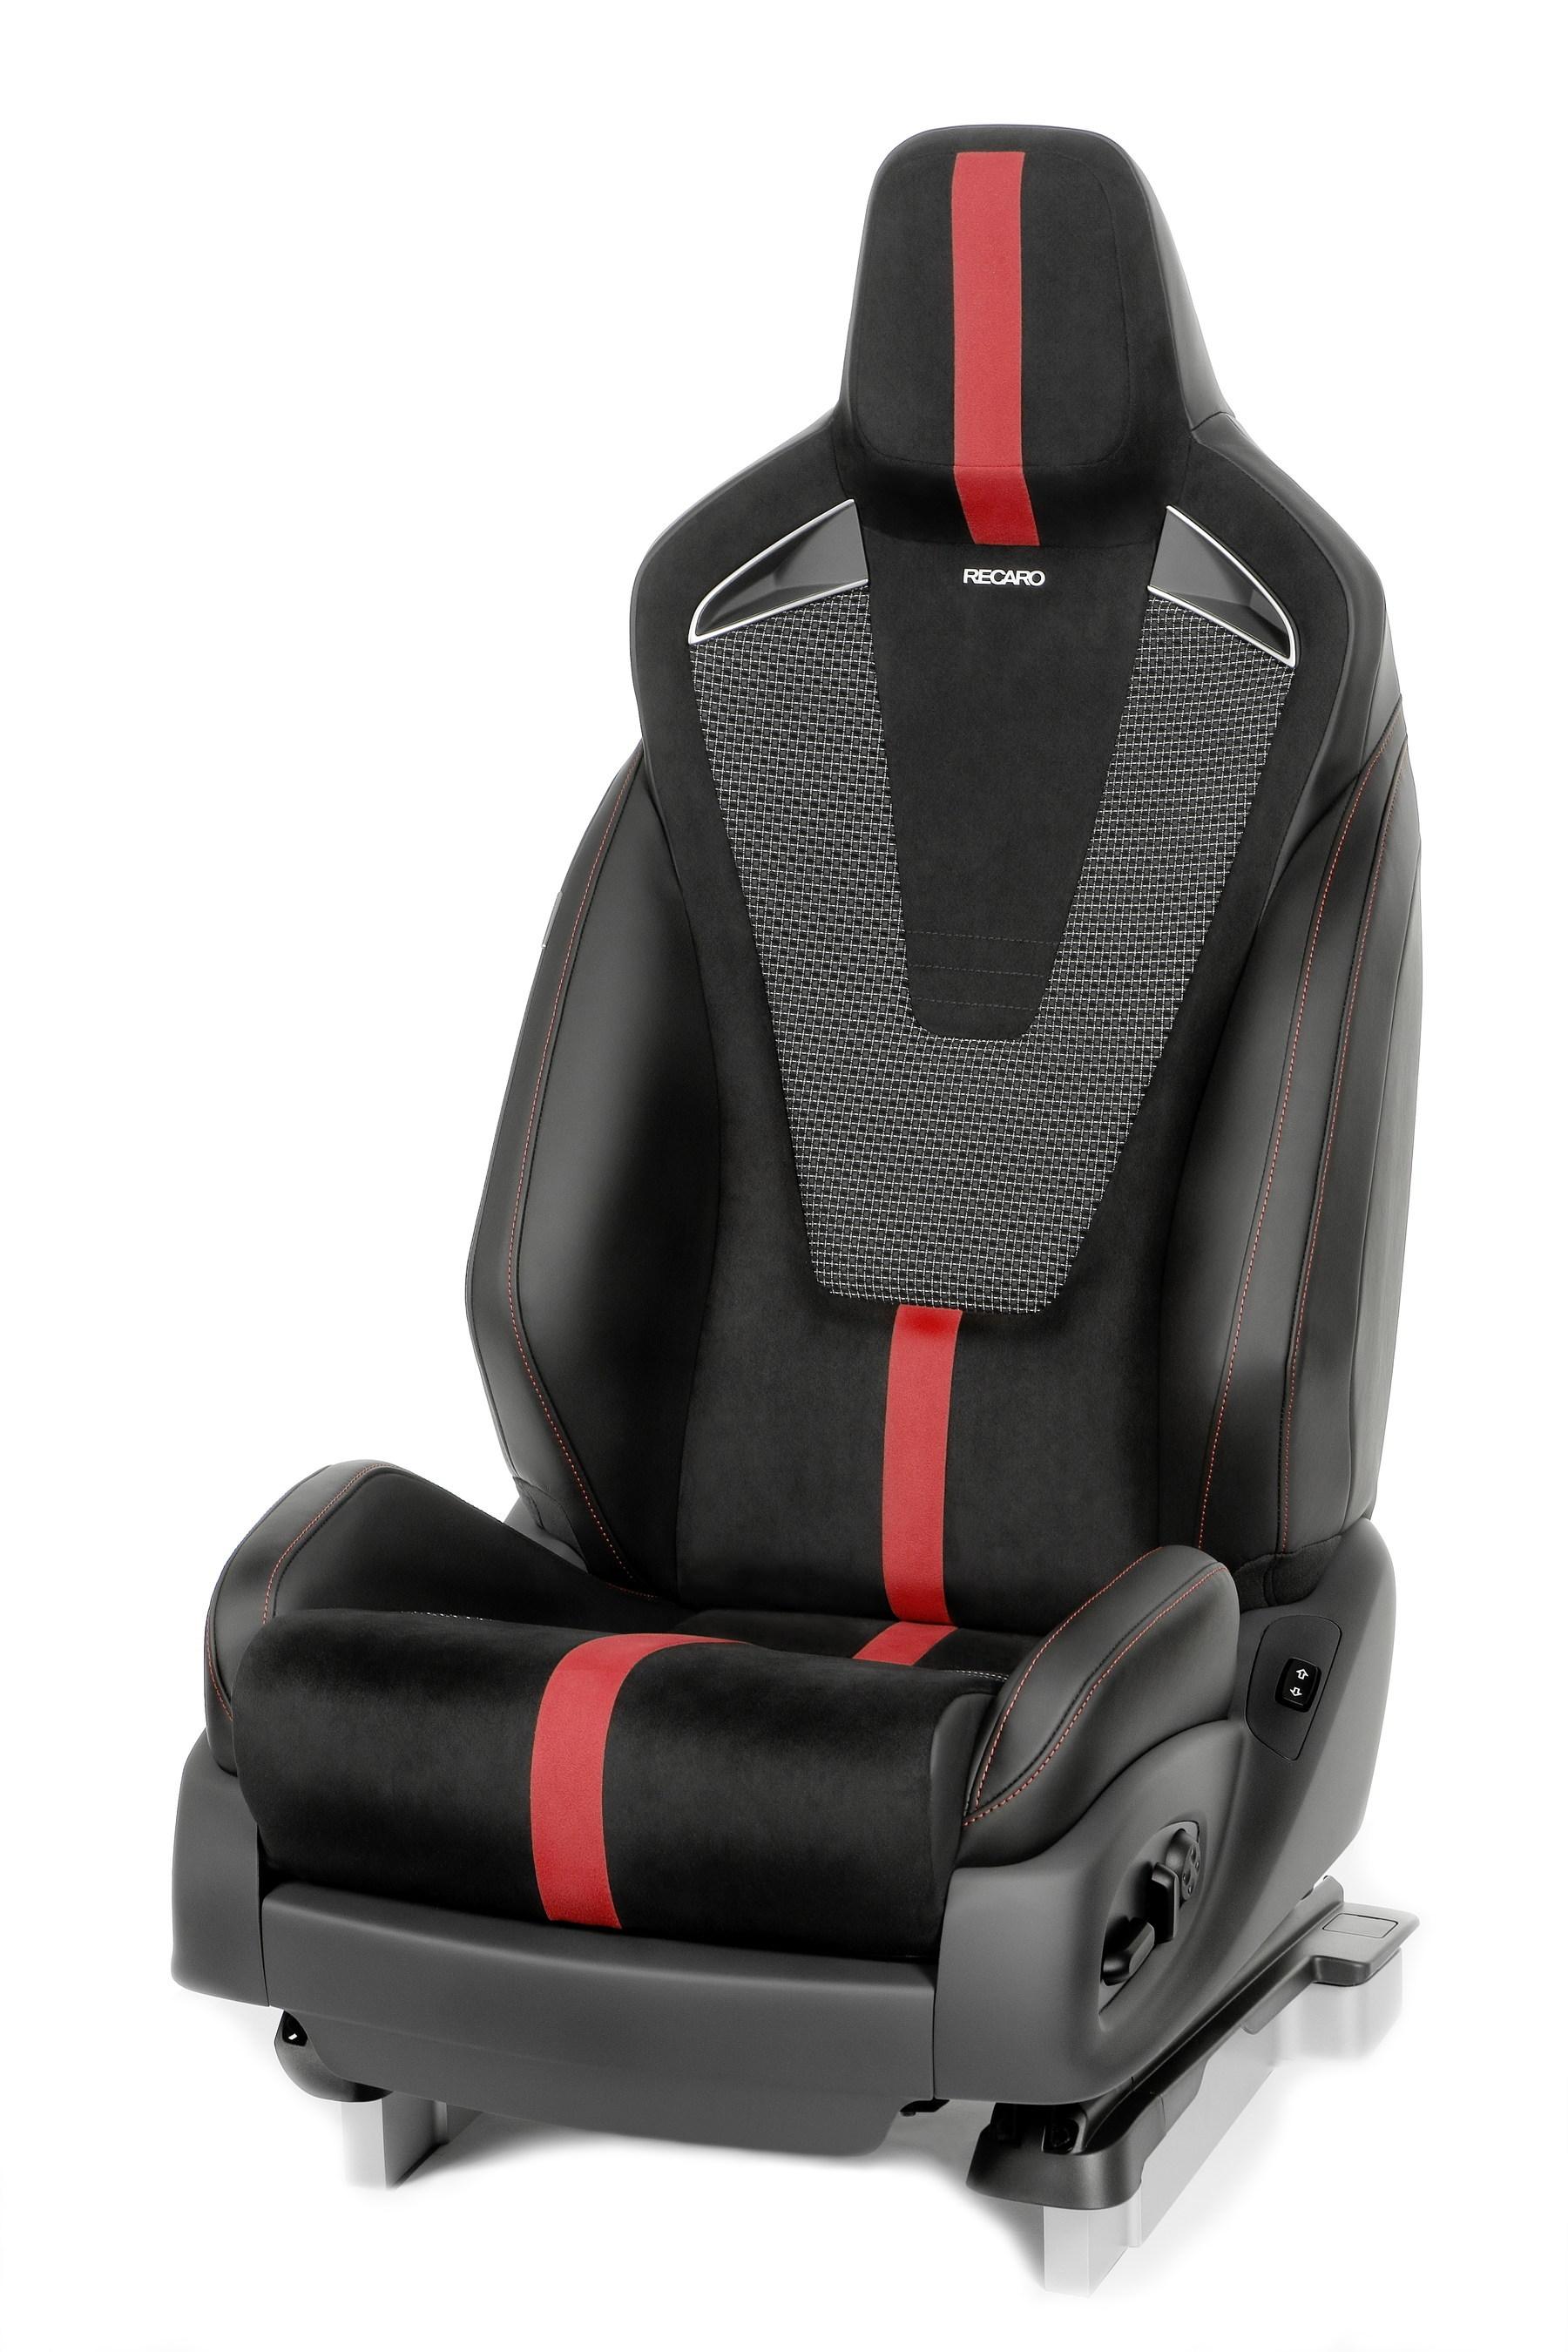 Private Car Sales >> RECARO Automotive Seating unveils three performance seat ...